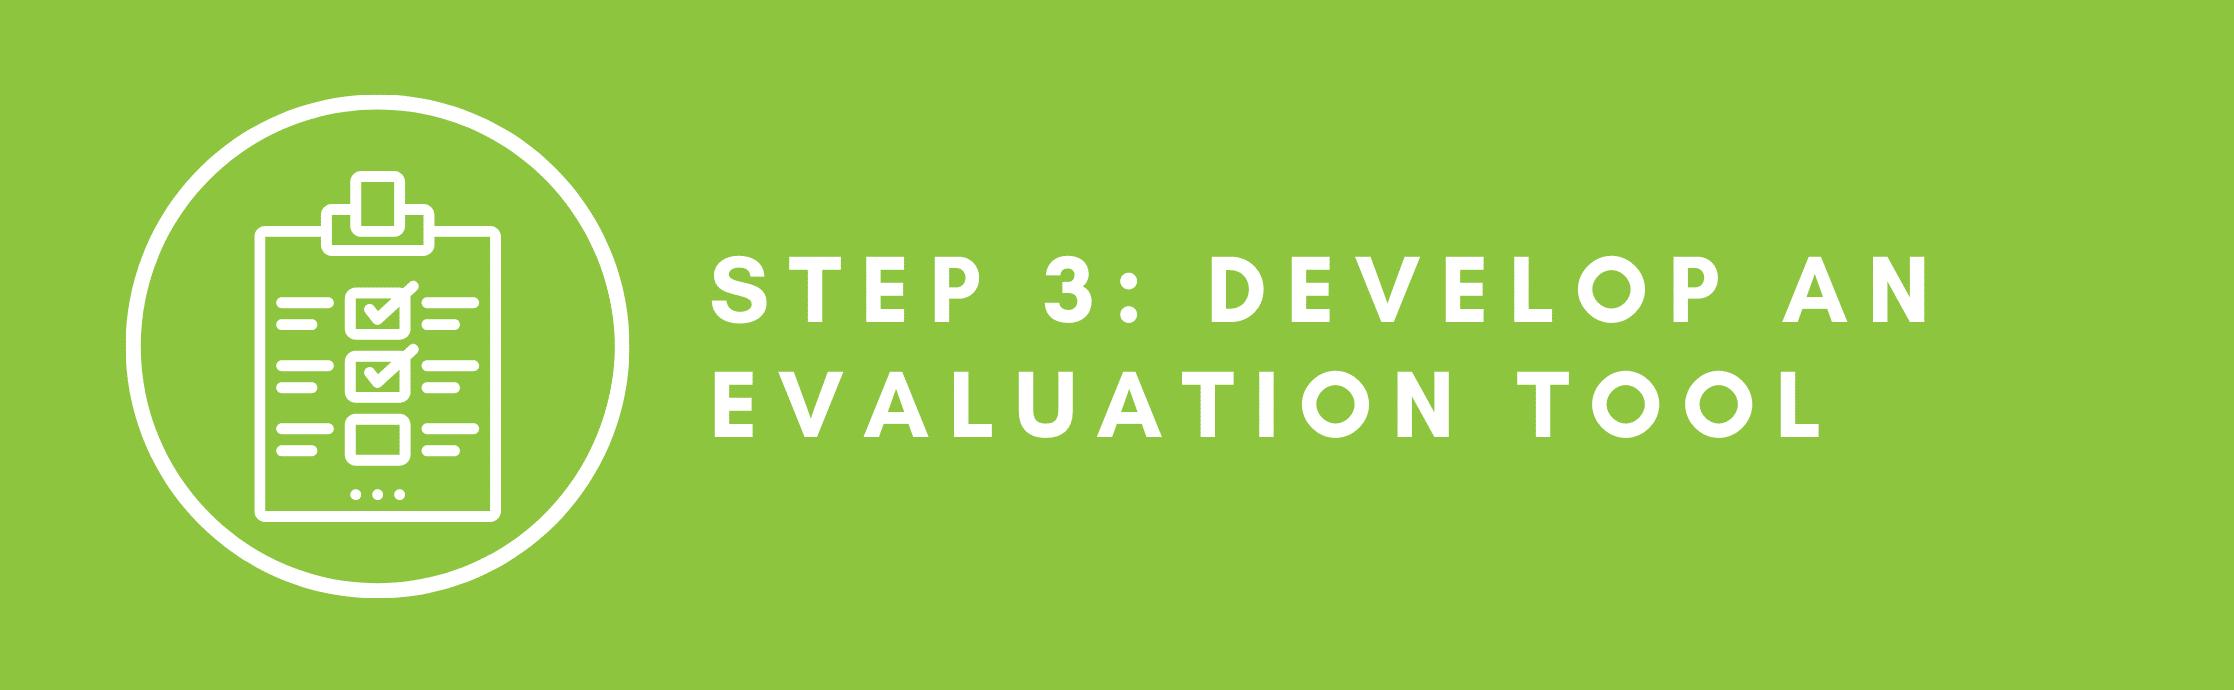 choosing-nonprofit-crm-software-step-3